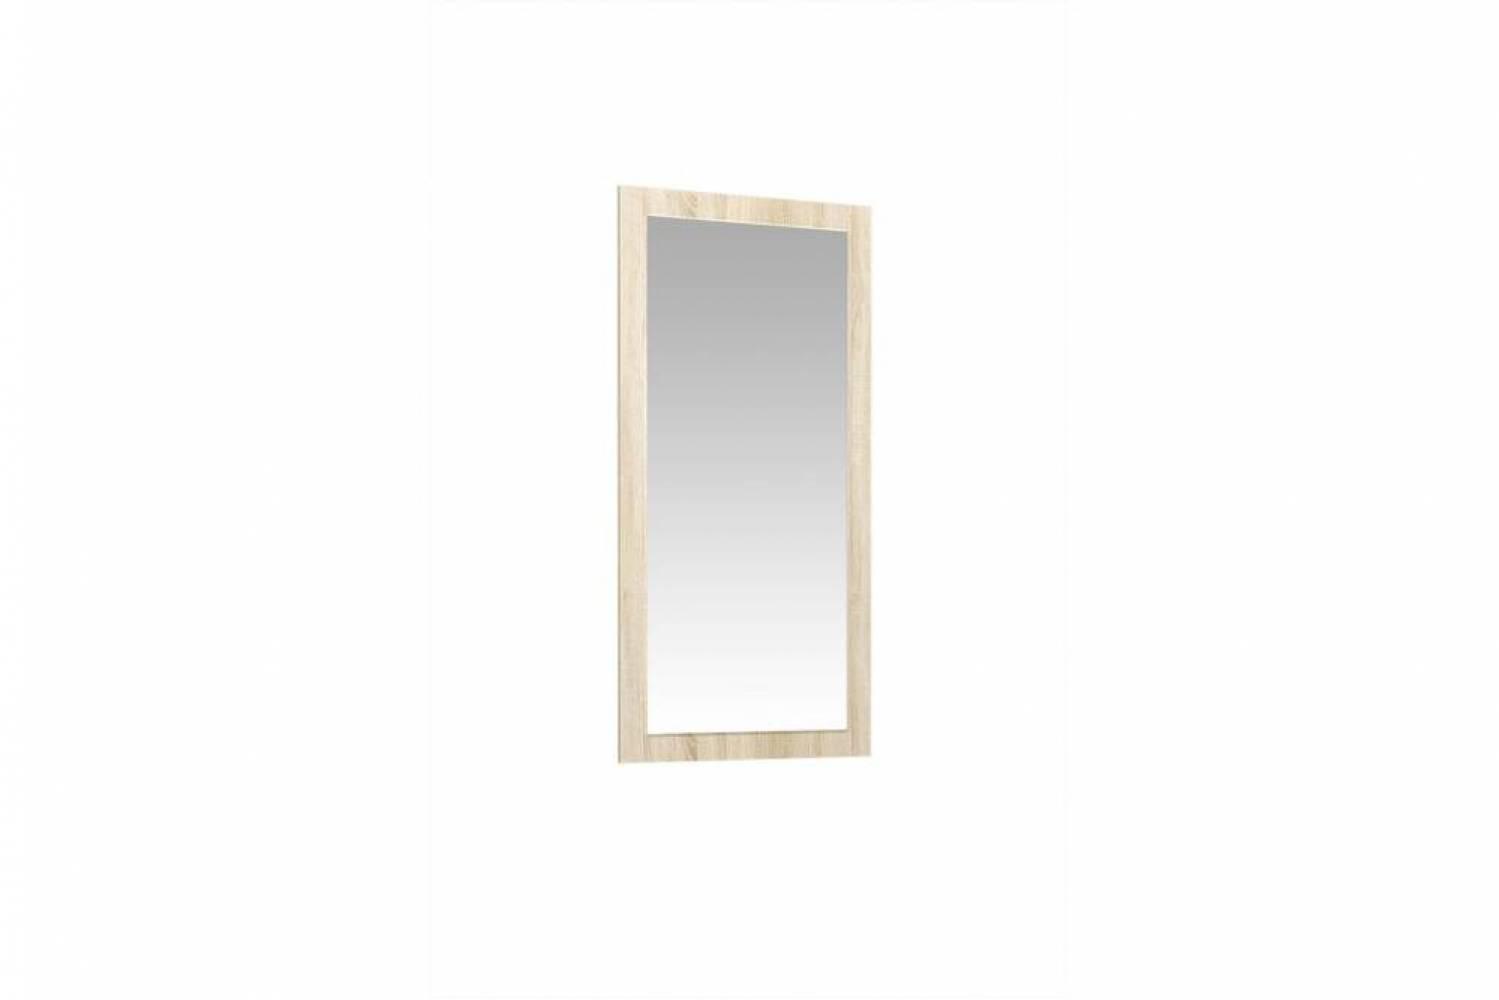 Зеркало навесное НМ 040.49 ОЛИВИЯ (Дуб Сонома)